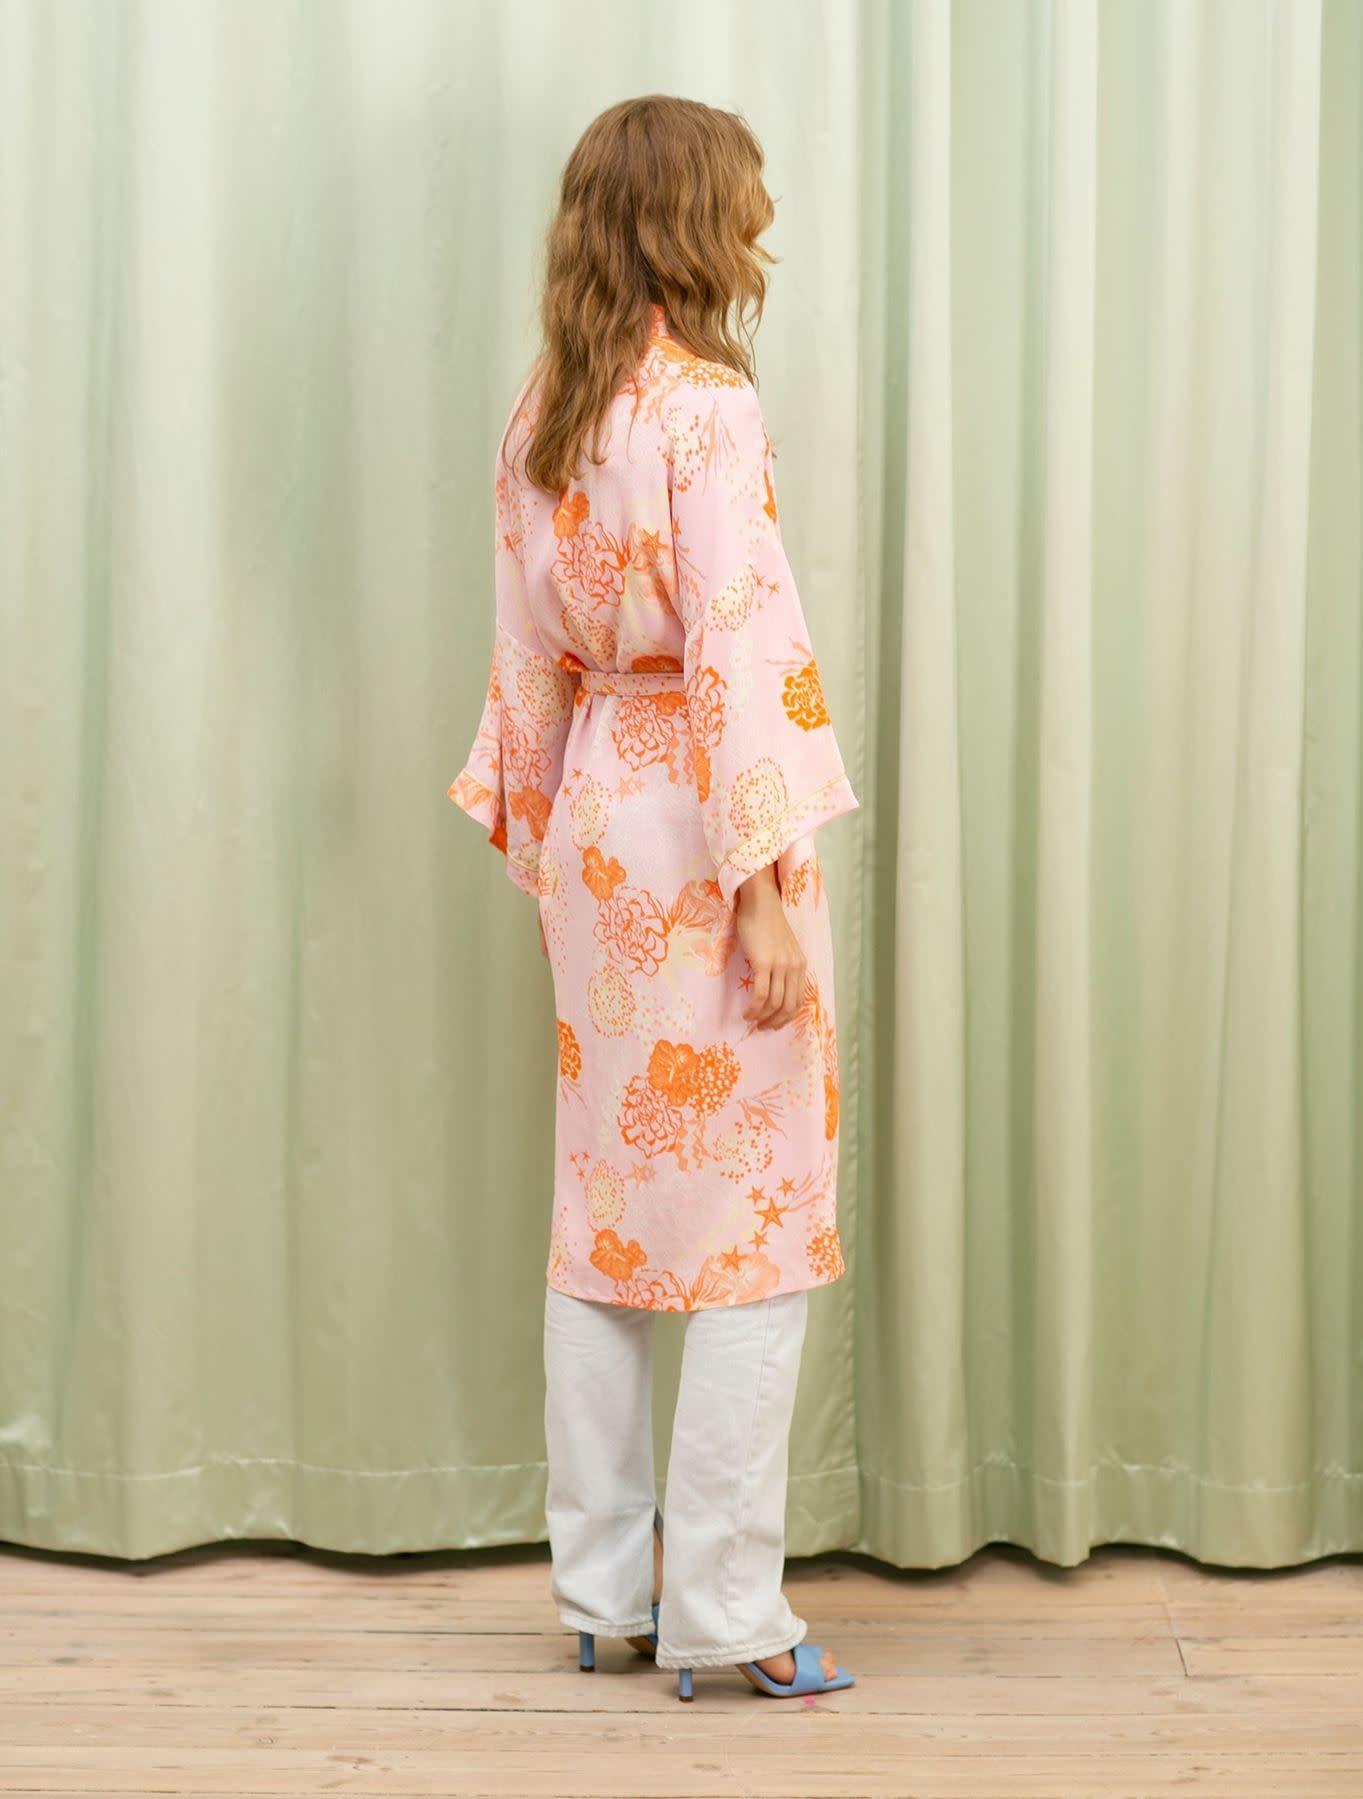 Beck Söndergaard Seabed Liberte Kimono - Ballerina size Large